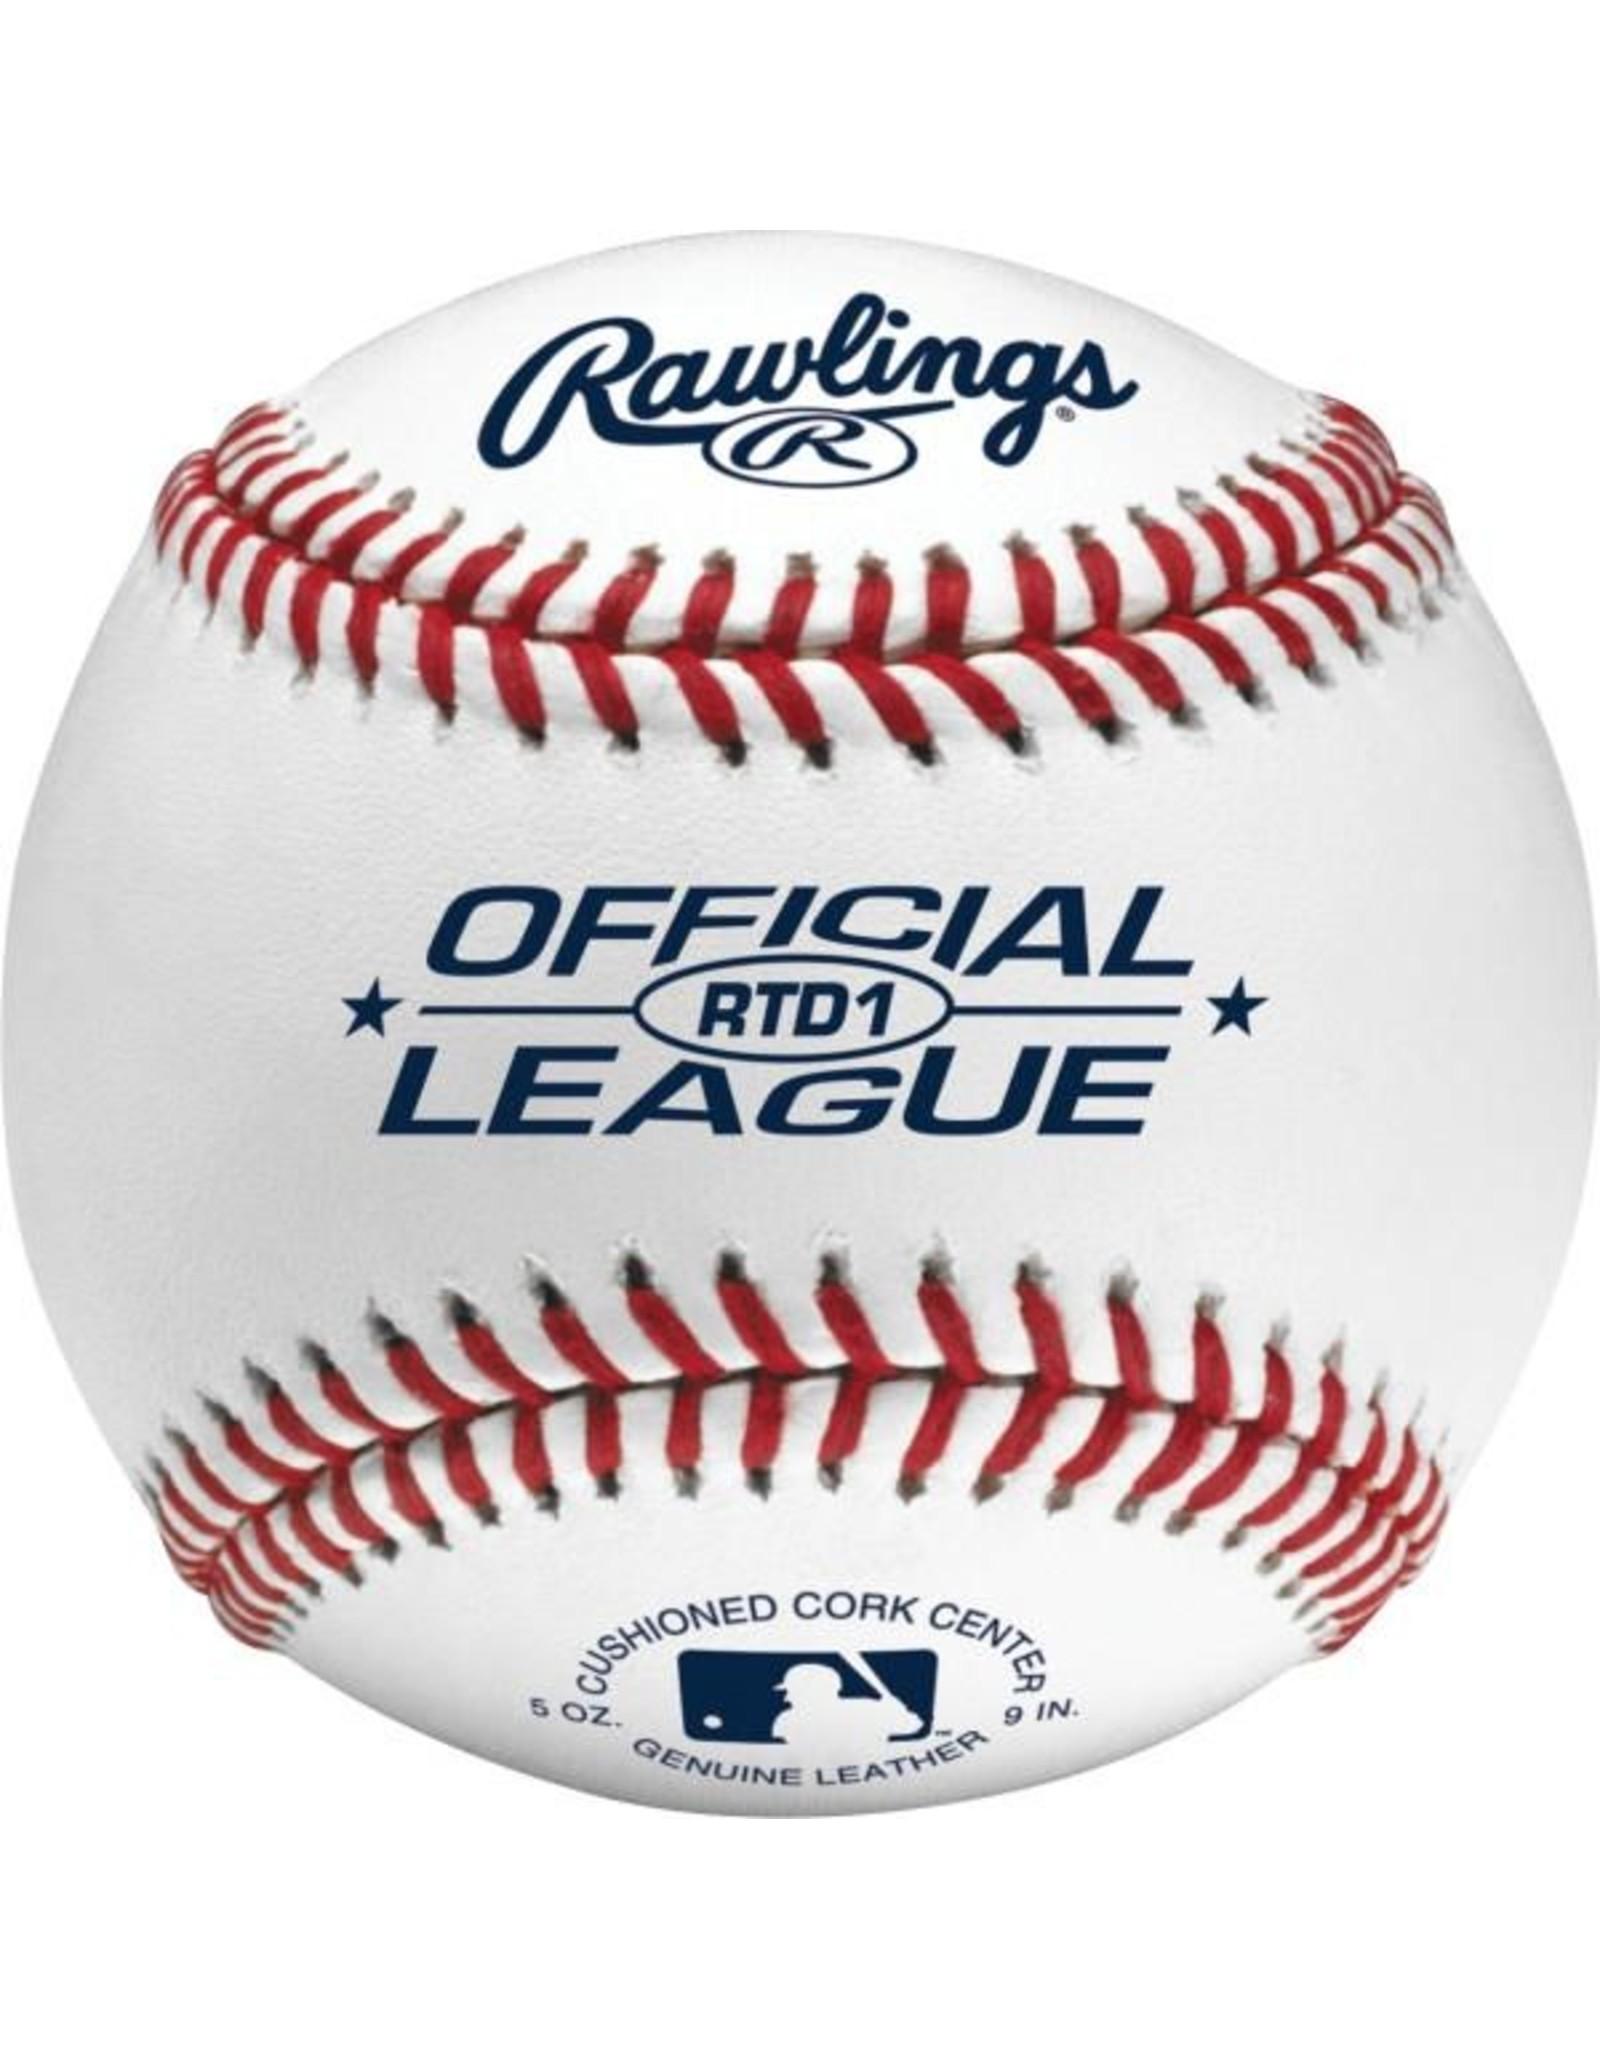 Rawlings Rawlings - 12 Balles 9'' Practice ball RTD1